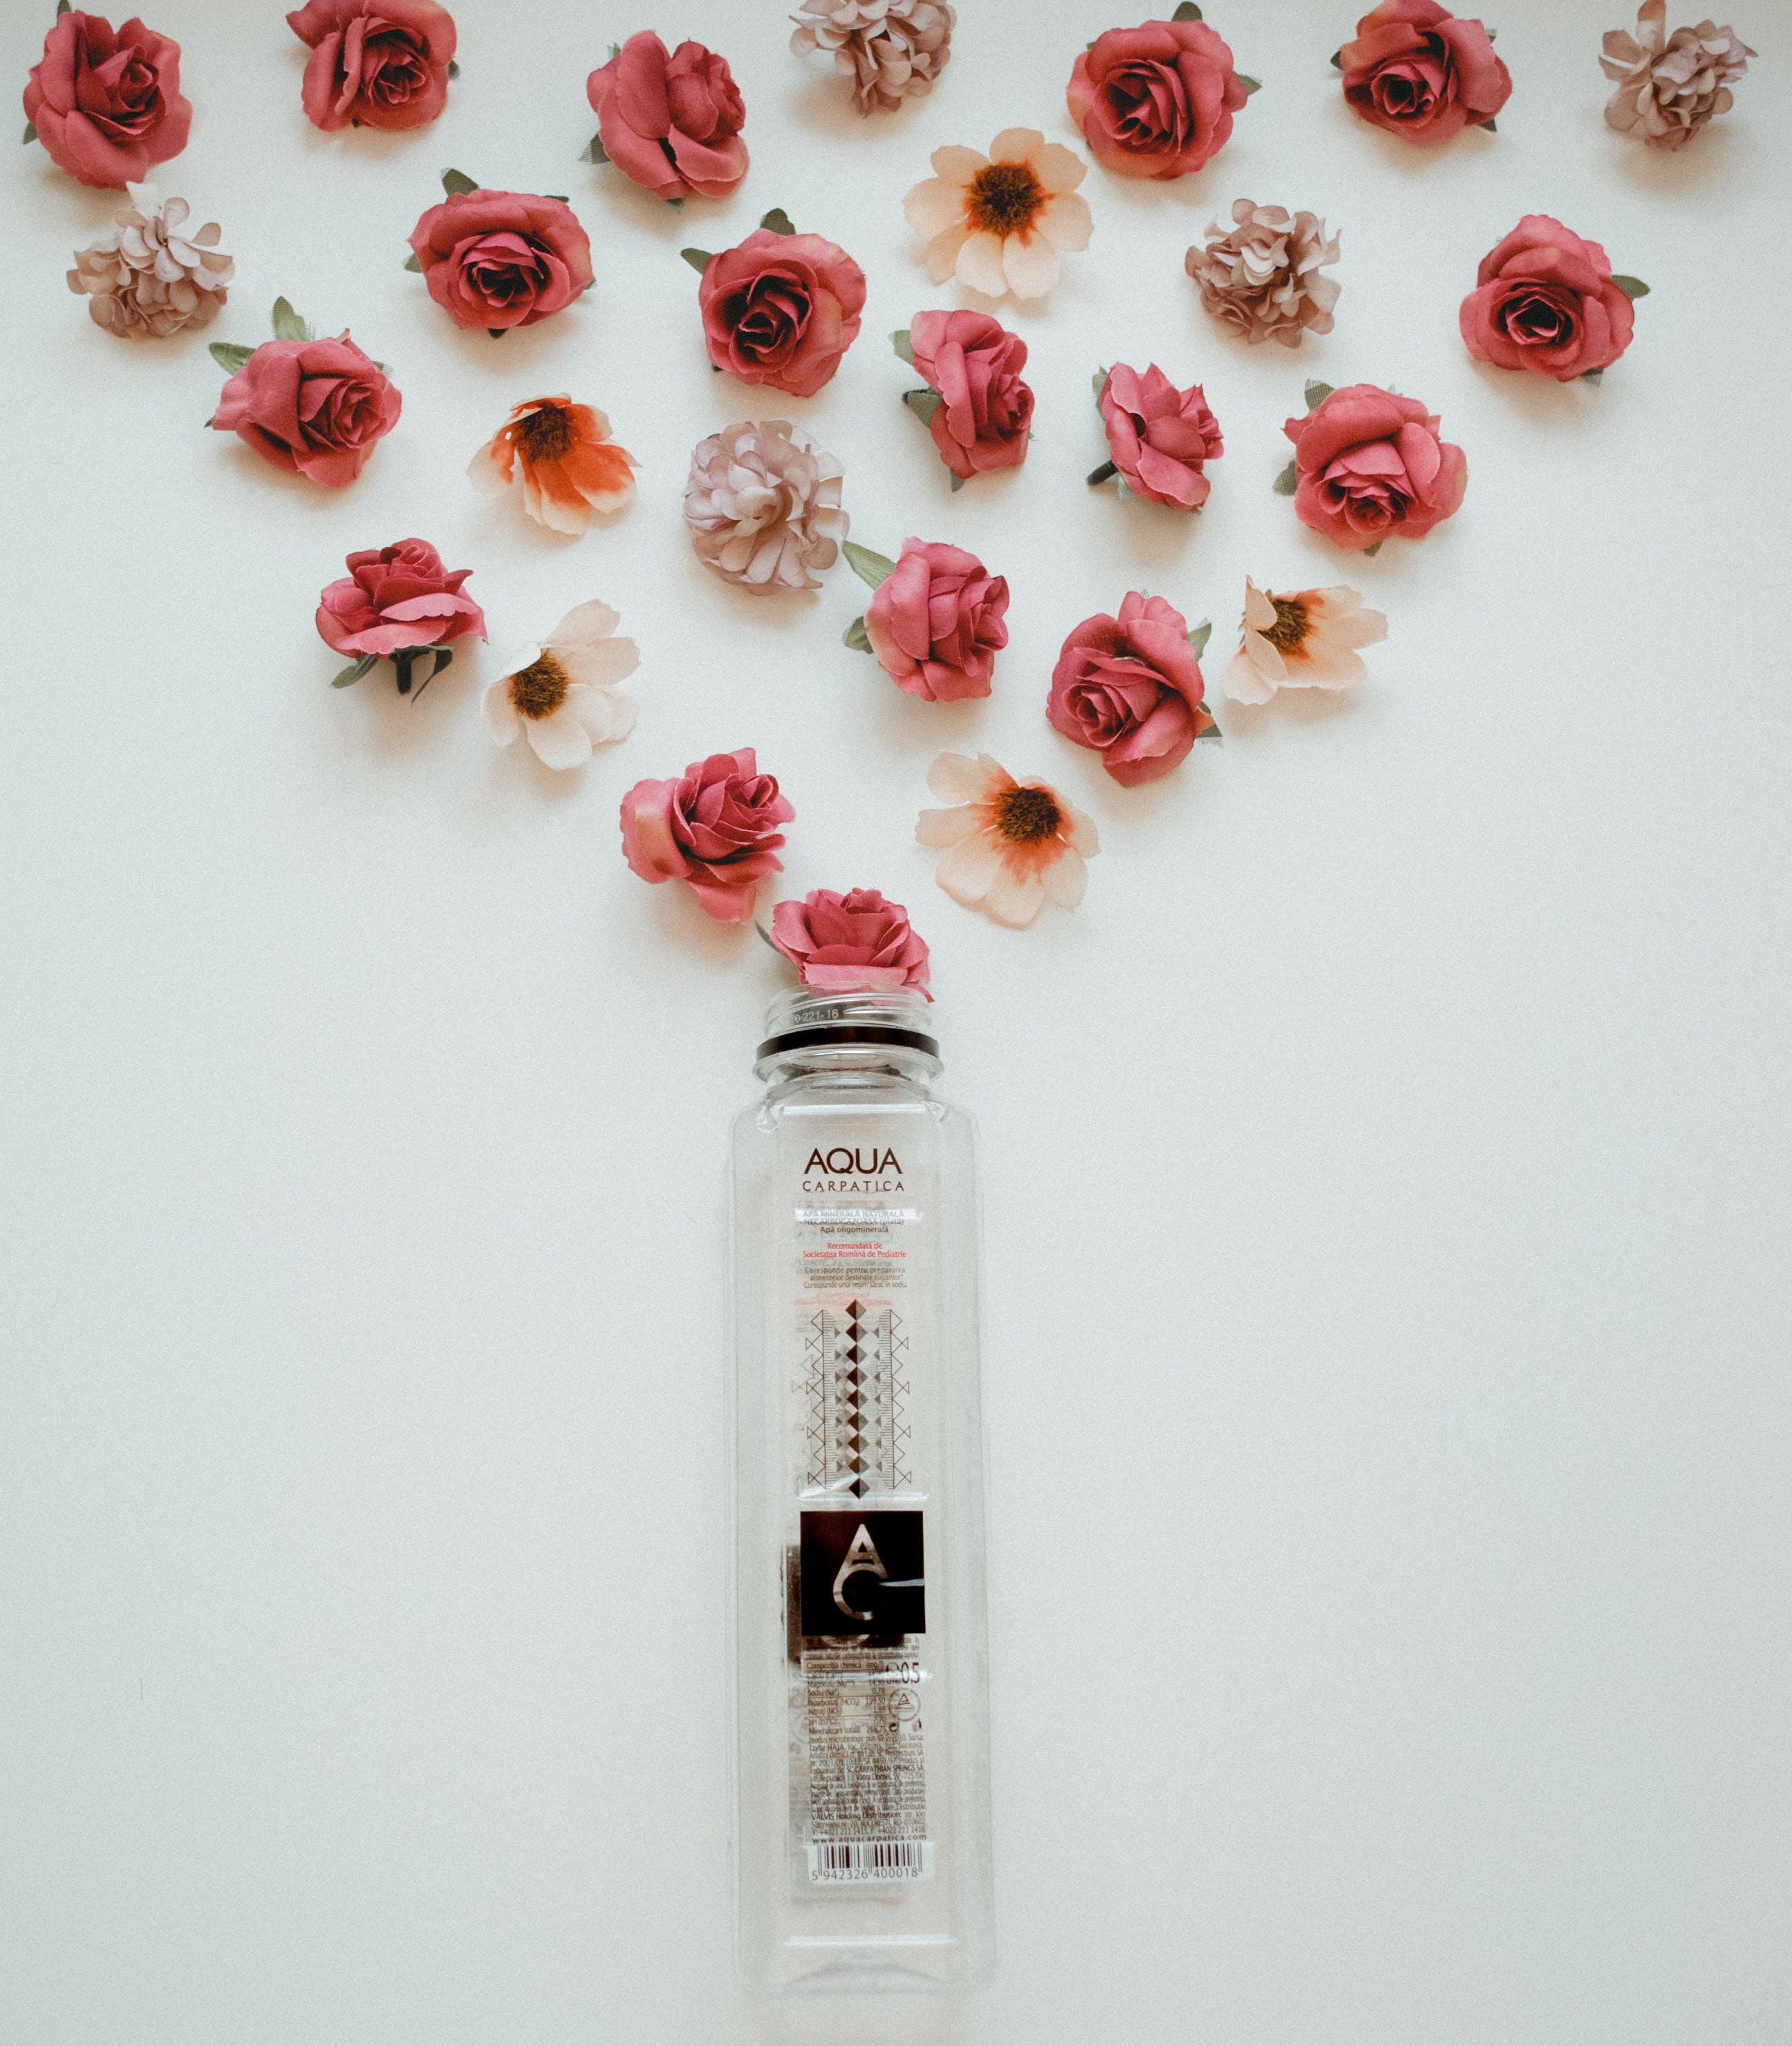 Aqua Fragrance Bottle and Roses Wall Decor